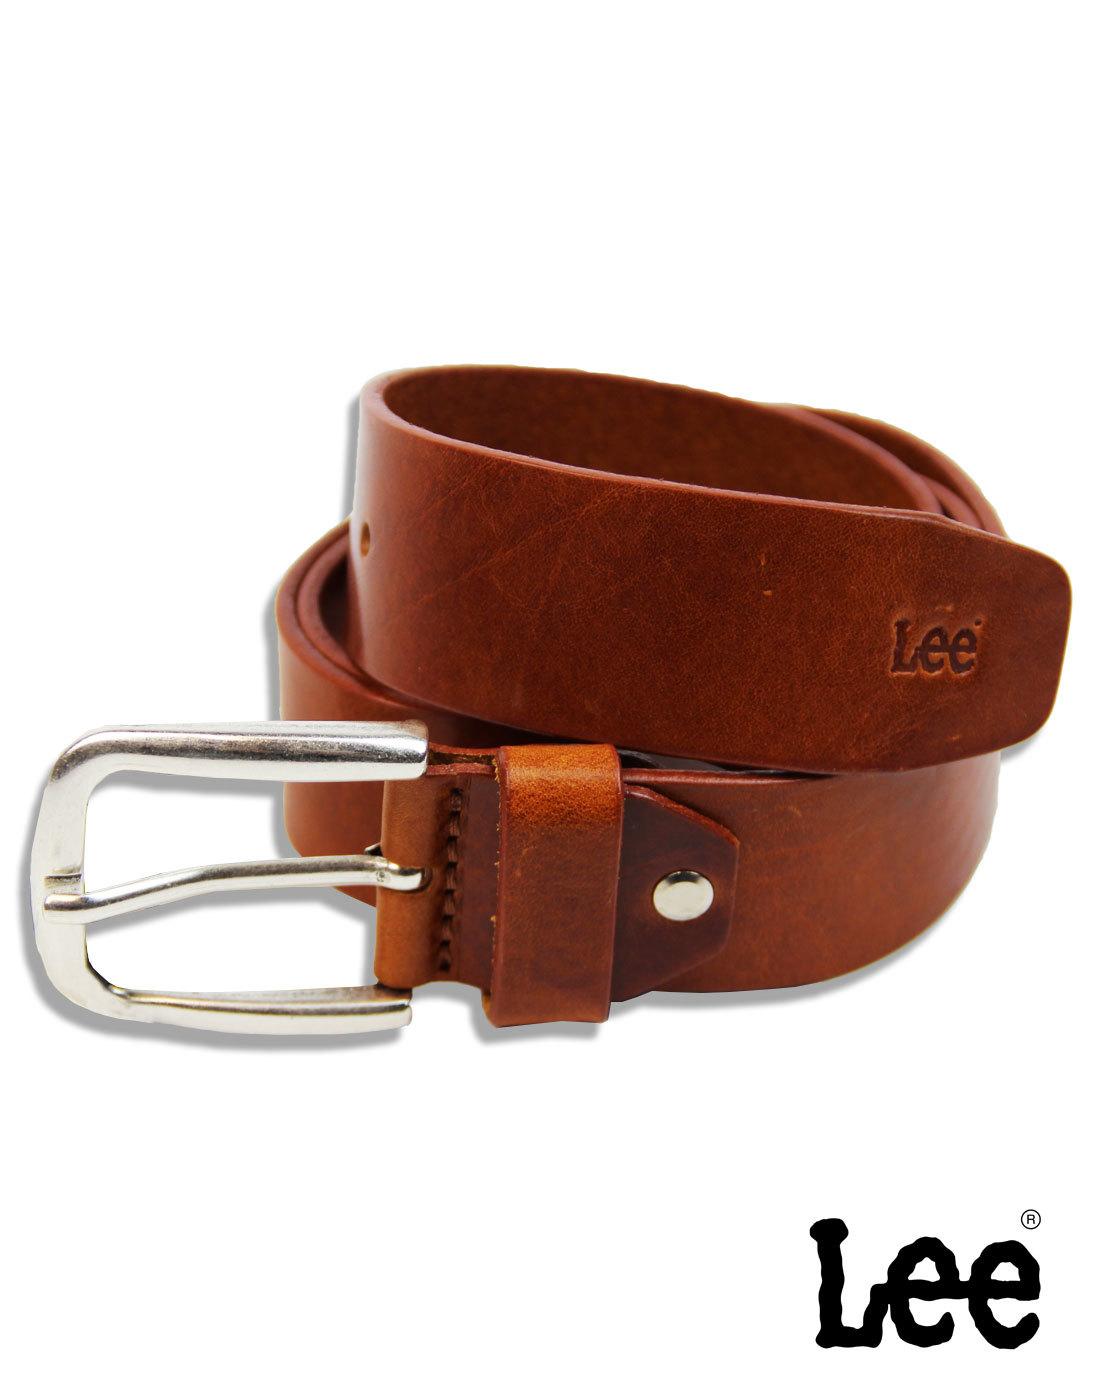 LEE Men's Cognac Leather Belt with Silver Buckle